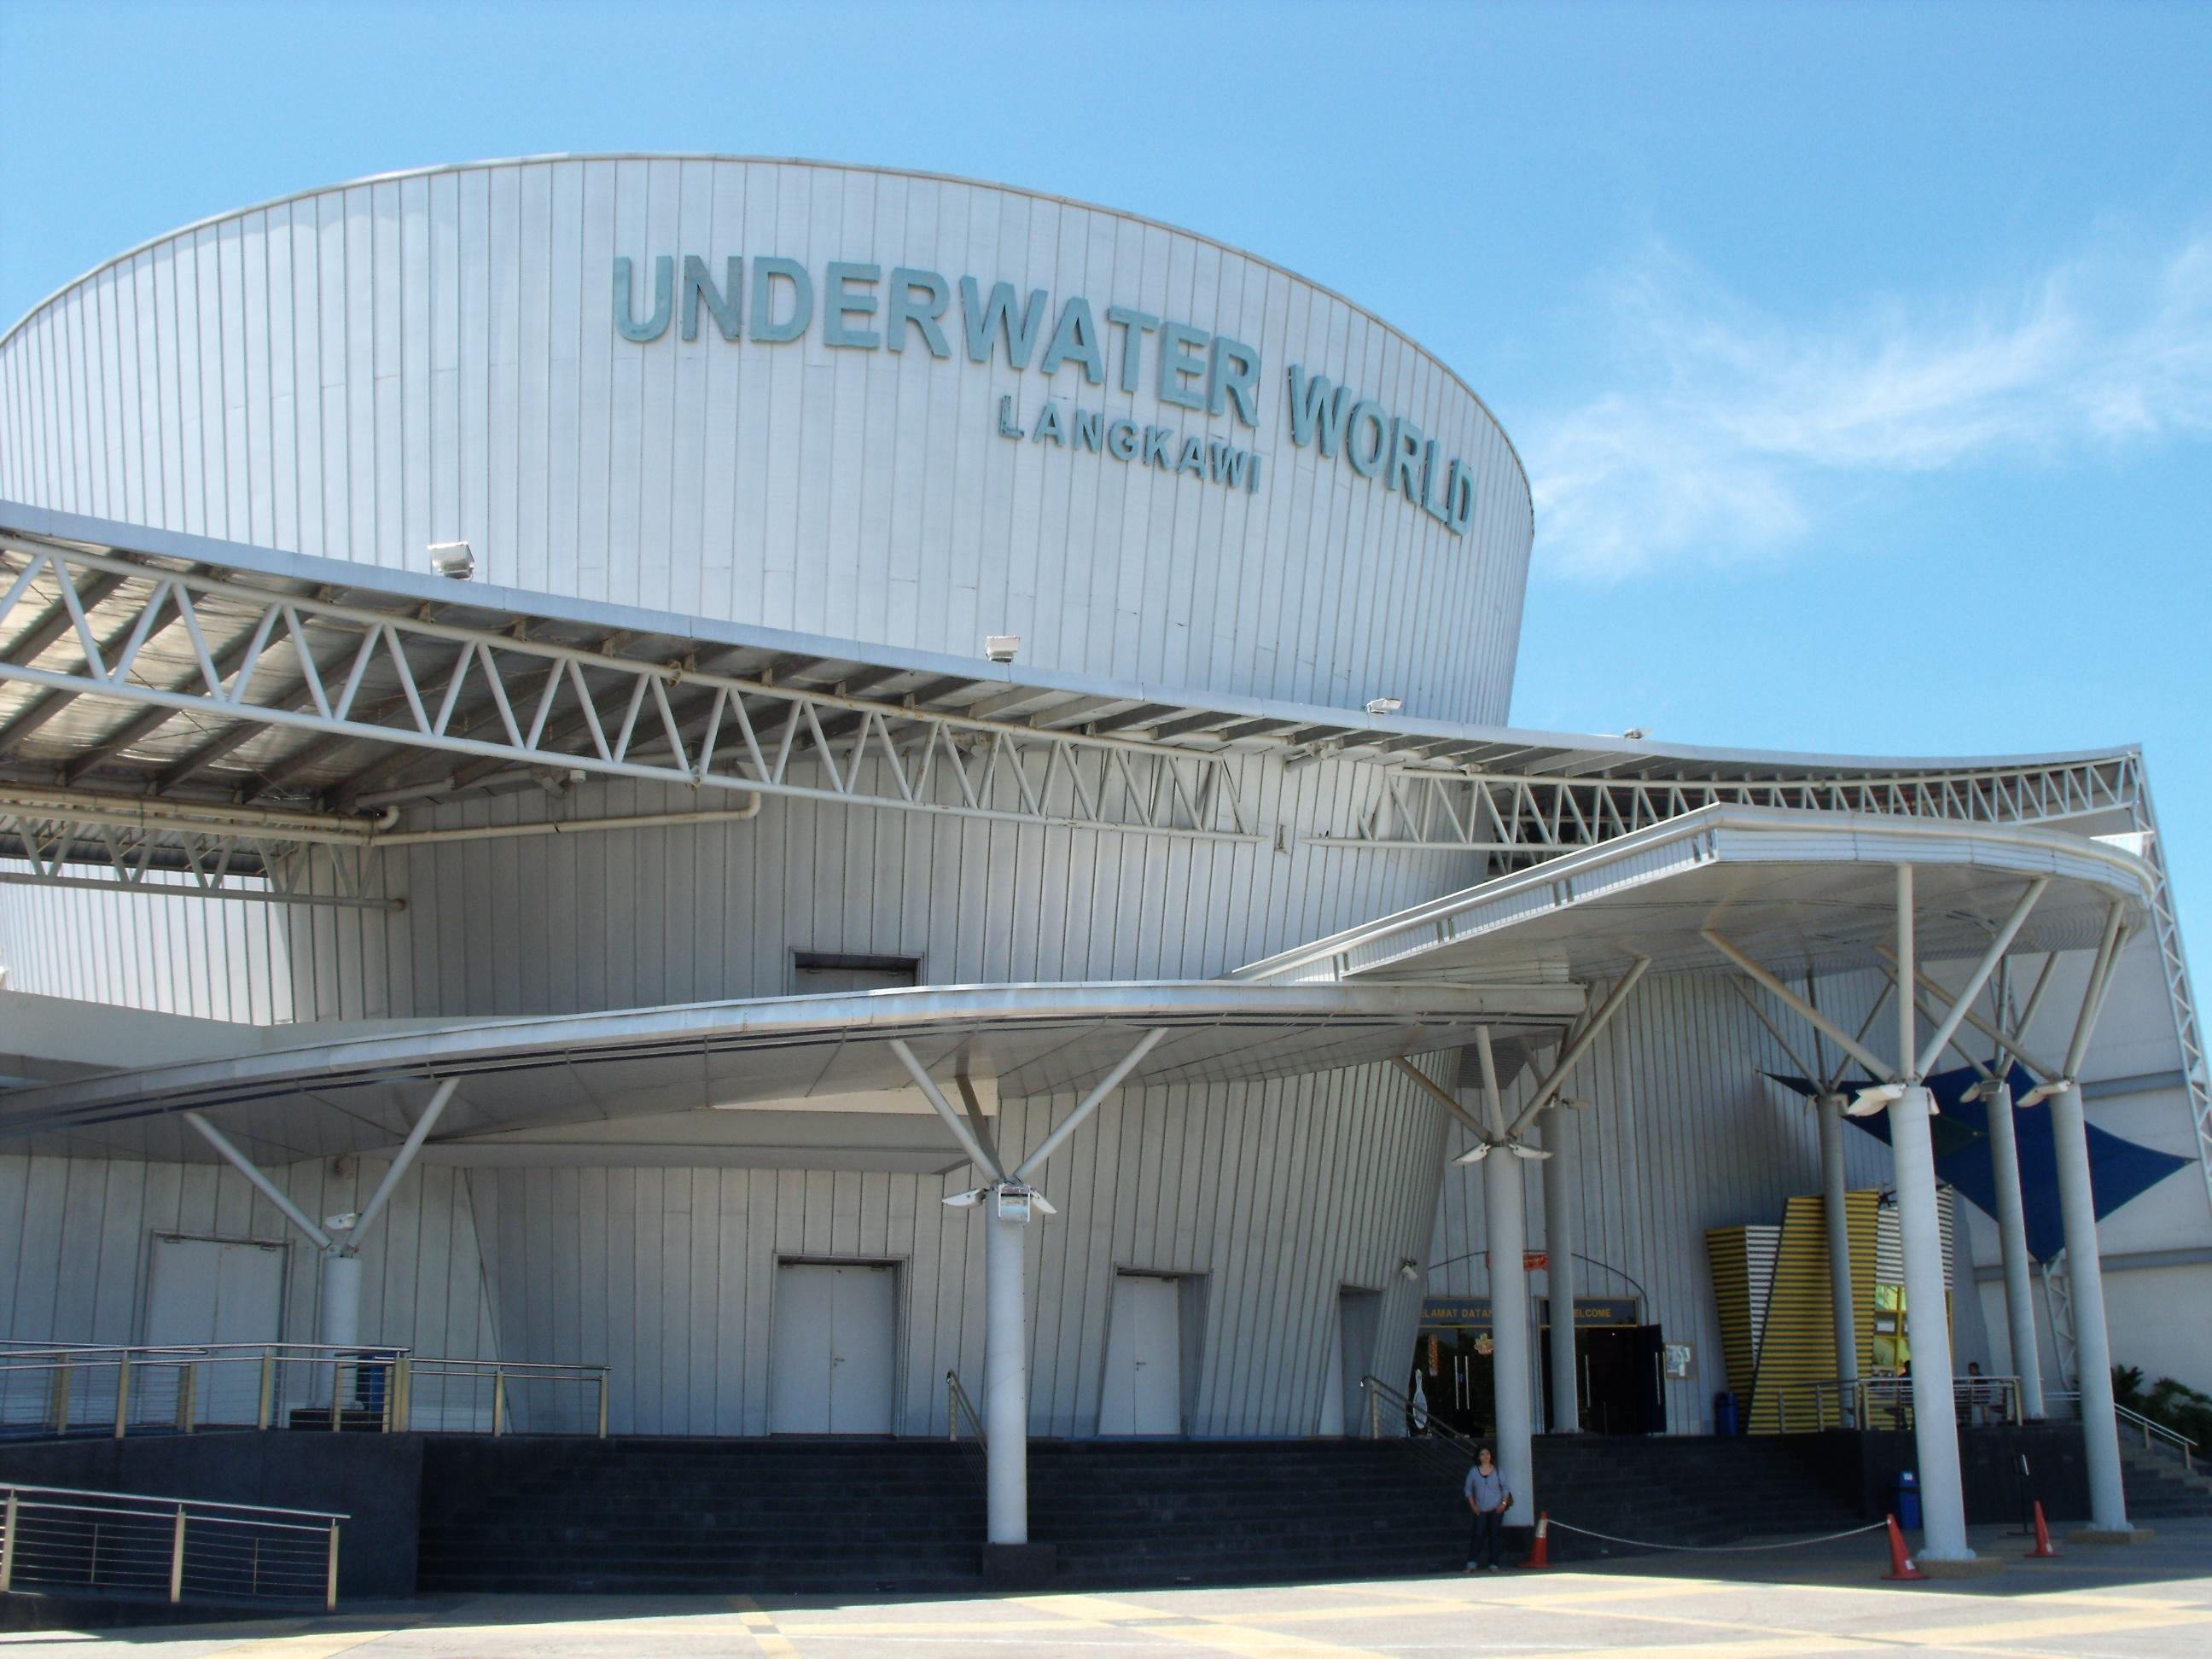 Description Entrance to Underwater World, Langkawi.jpg